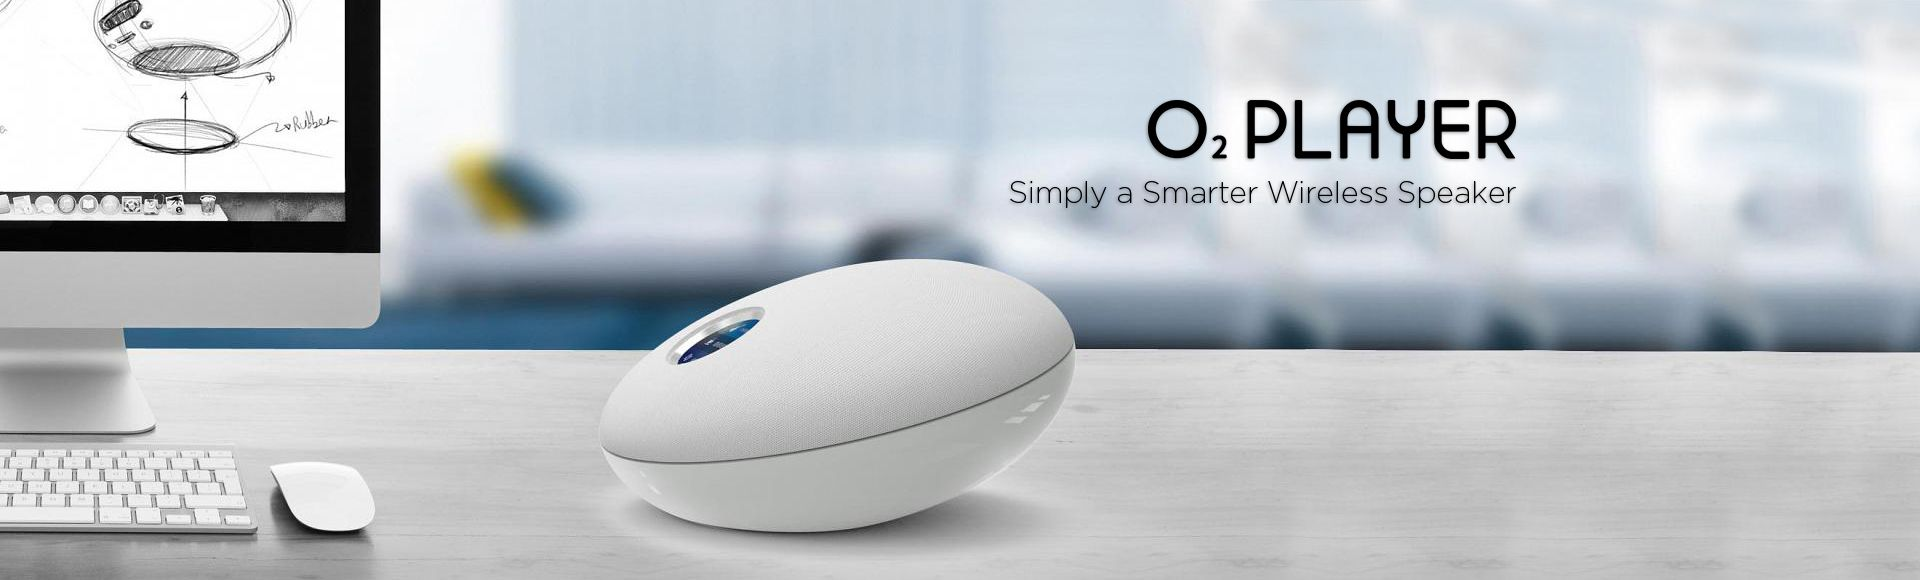 O2 PLAYER - Smarter Wireless Speaker - Simply a smarter wireless speaker